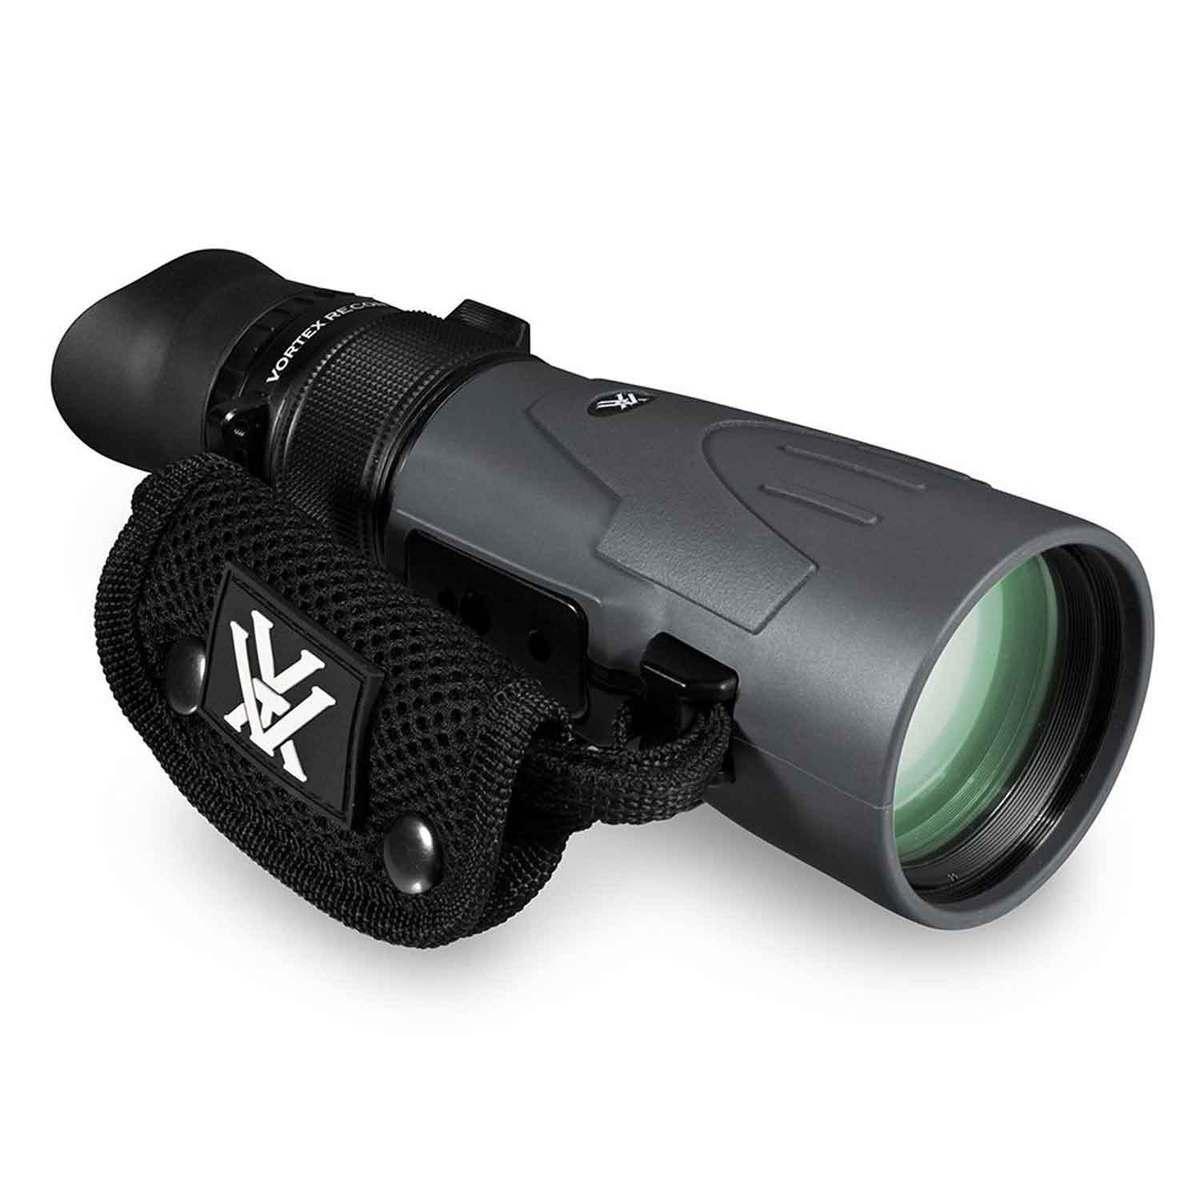 ortex Recon RT 15x50 Spotting Scope - Straight